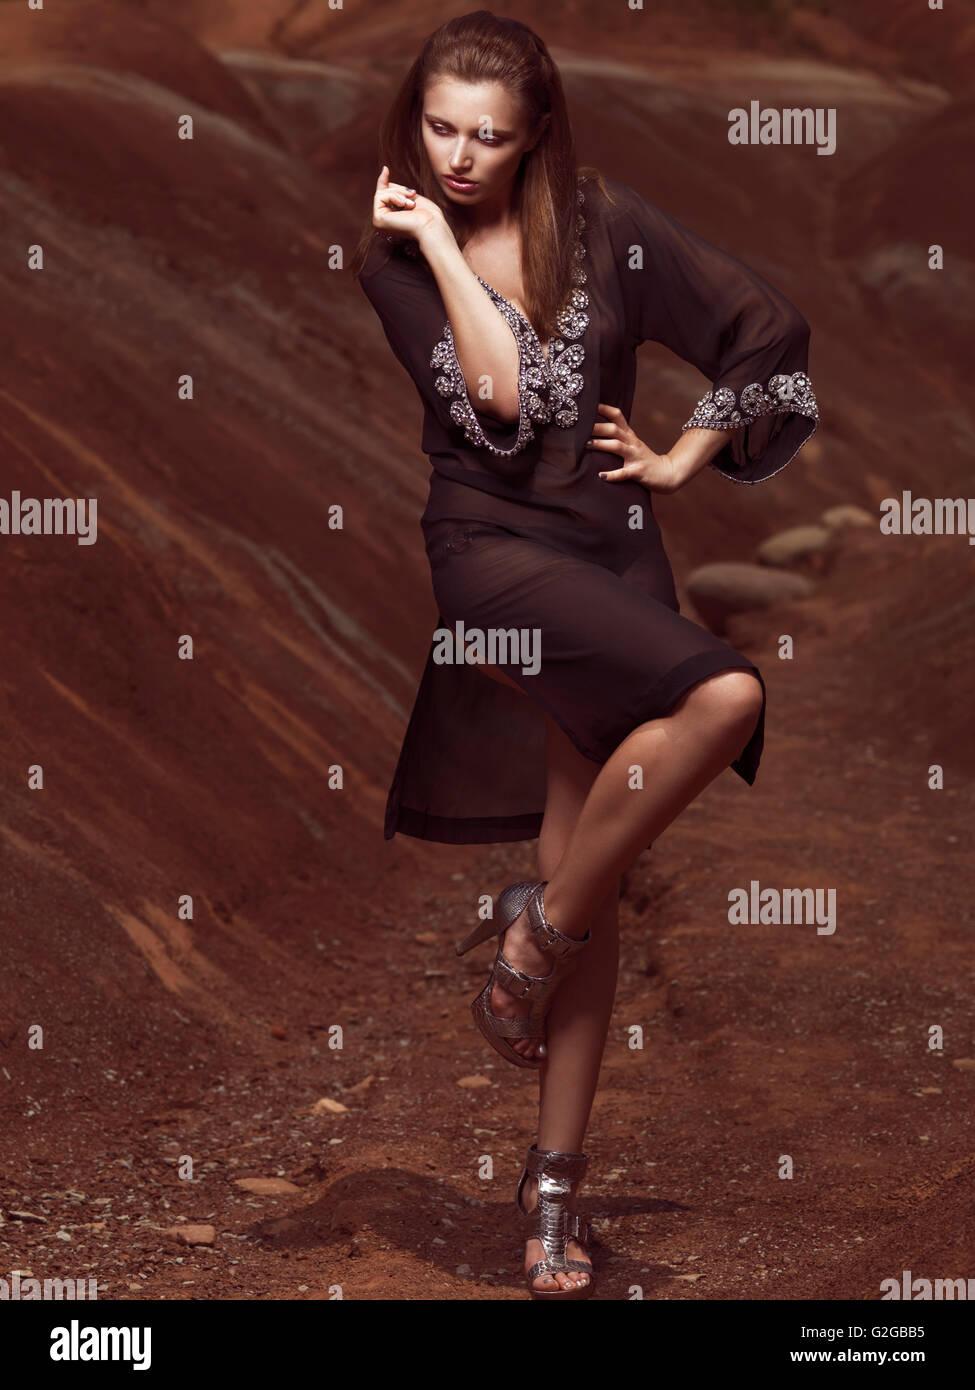 Sheer Dress Stockfotos & Sheer Dress Bilder - Alamy